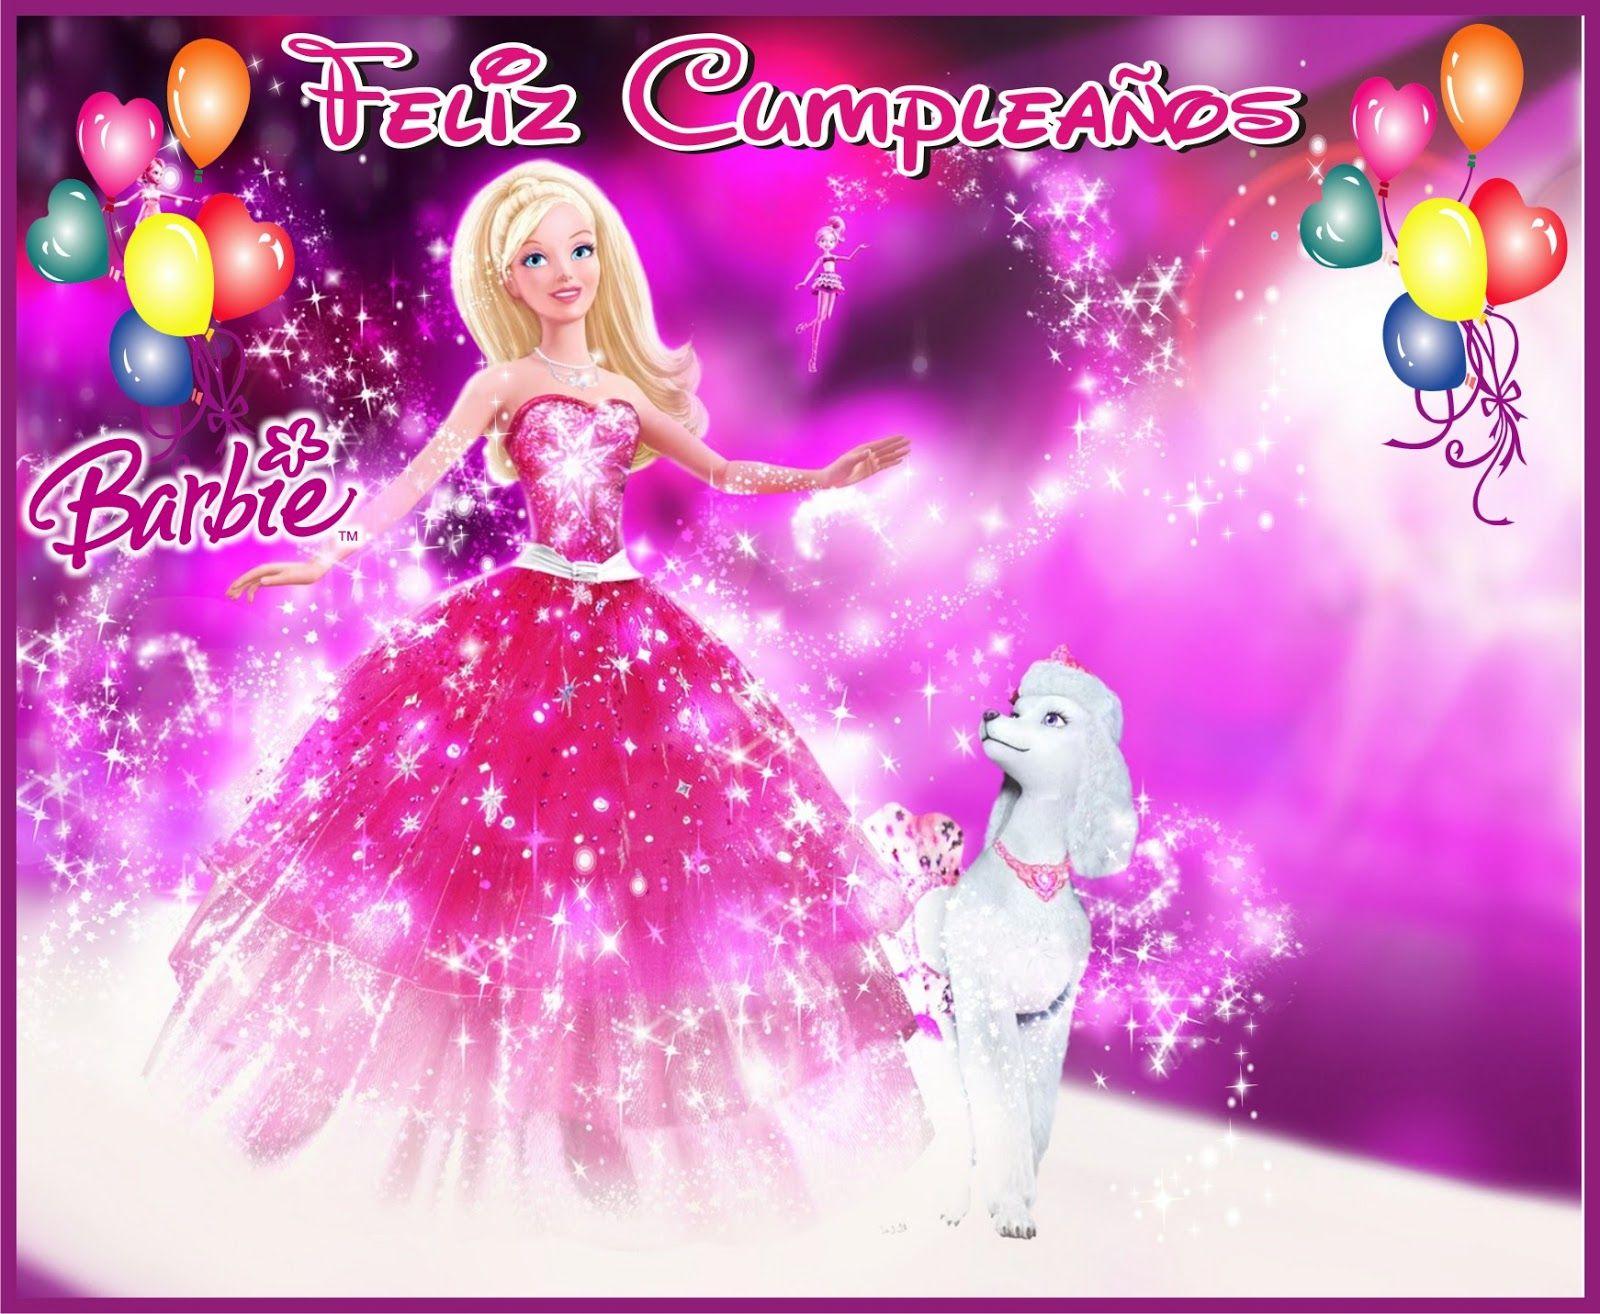 Tarjetas De Cumpleaos Barbie Para Ver Desde El Celular E Imprimir